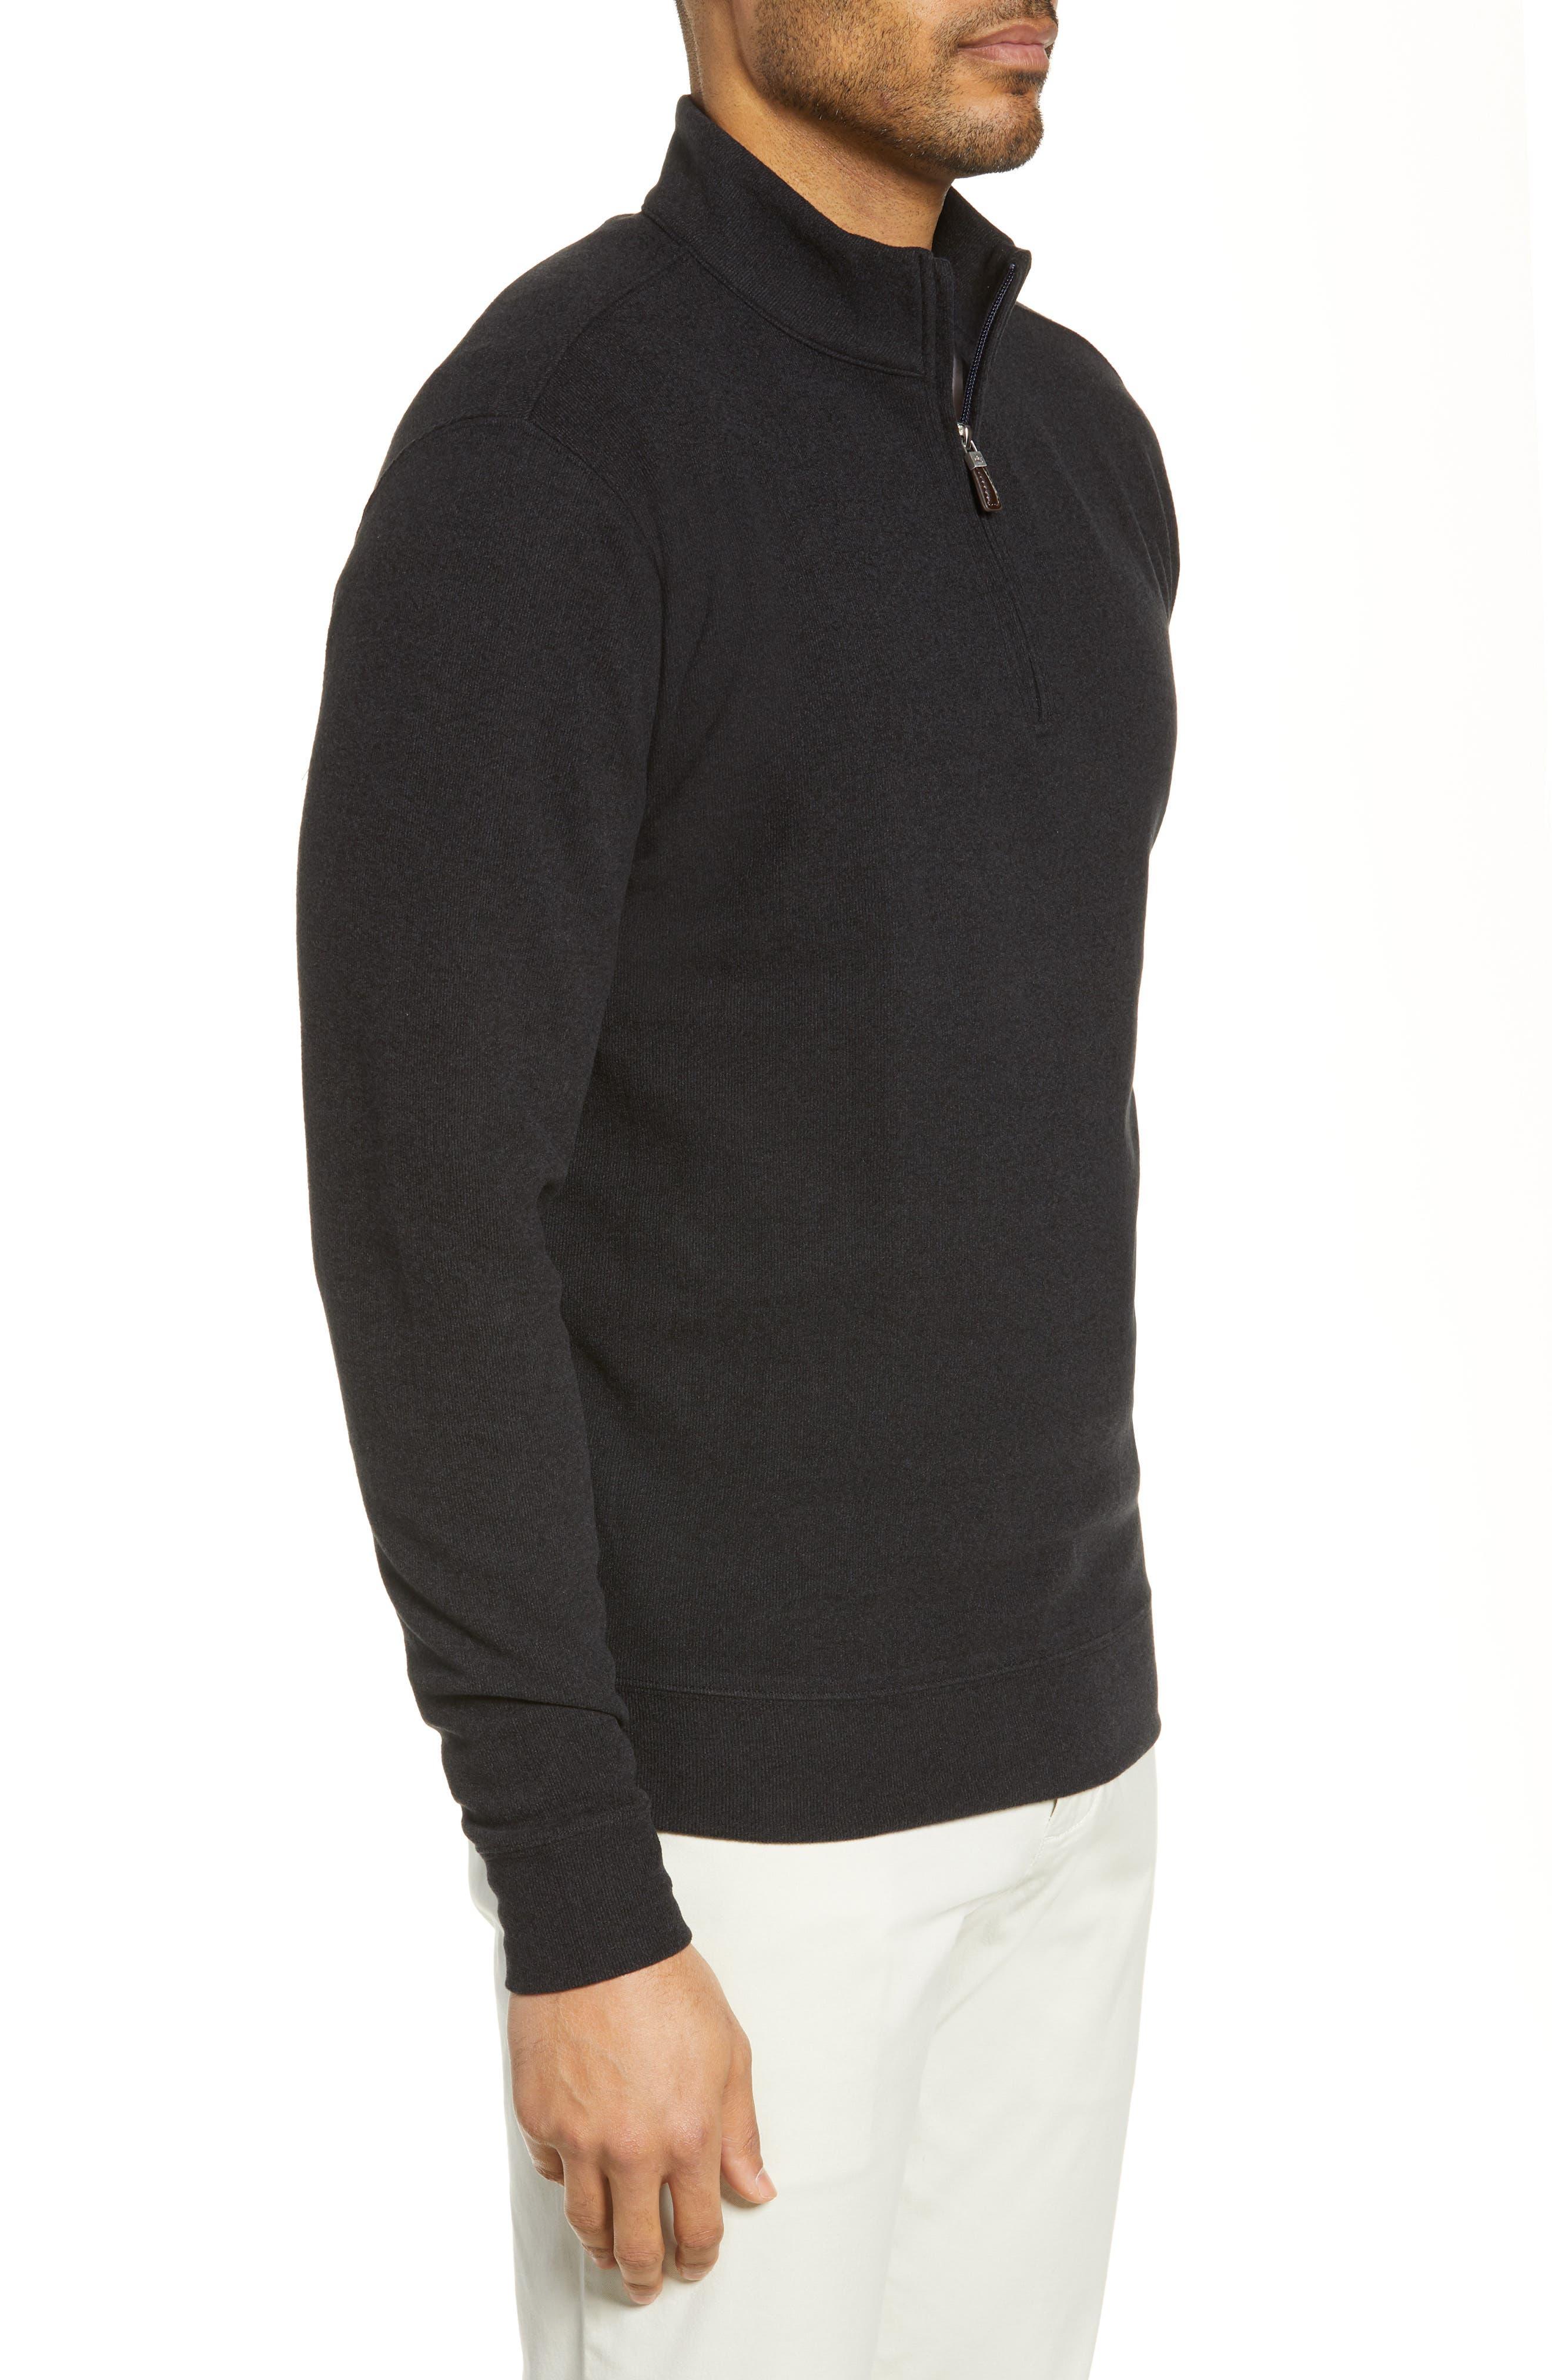 PETER MILLAR, Half Zip Pullover, Alternate thumbnail 3, color, BLACK